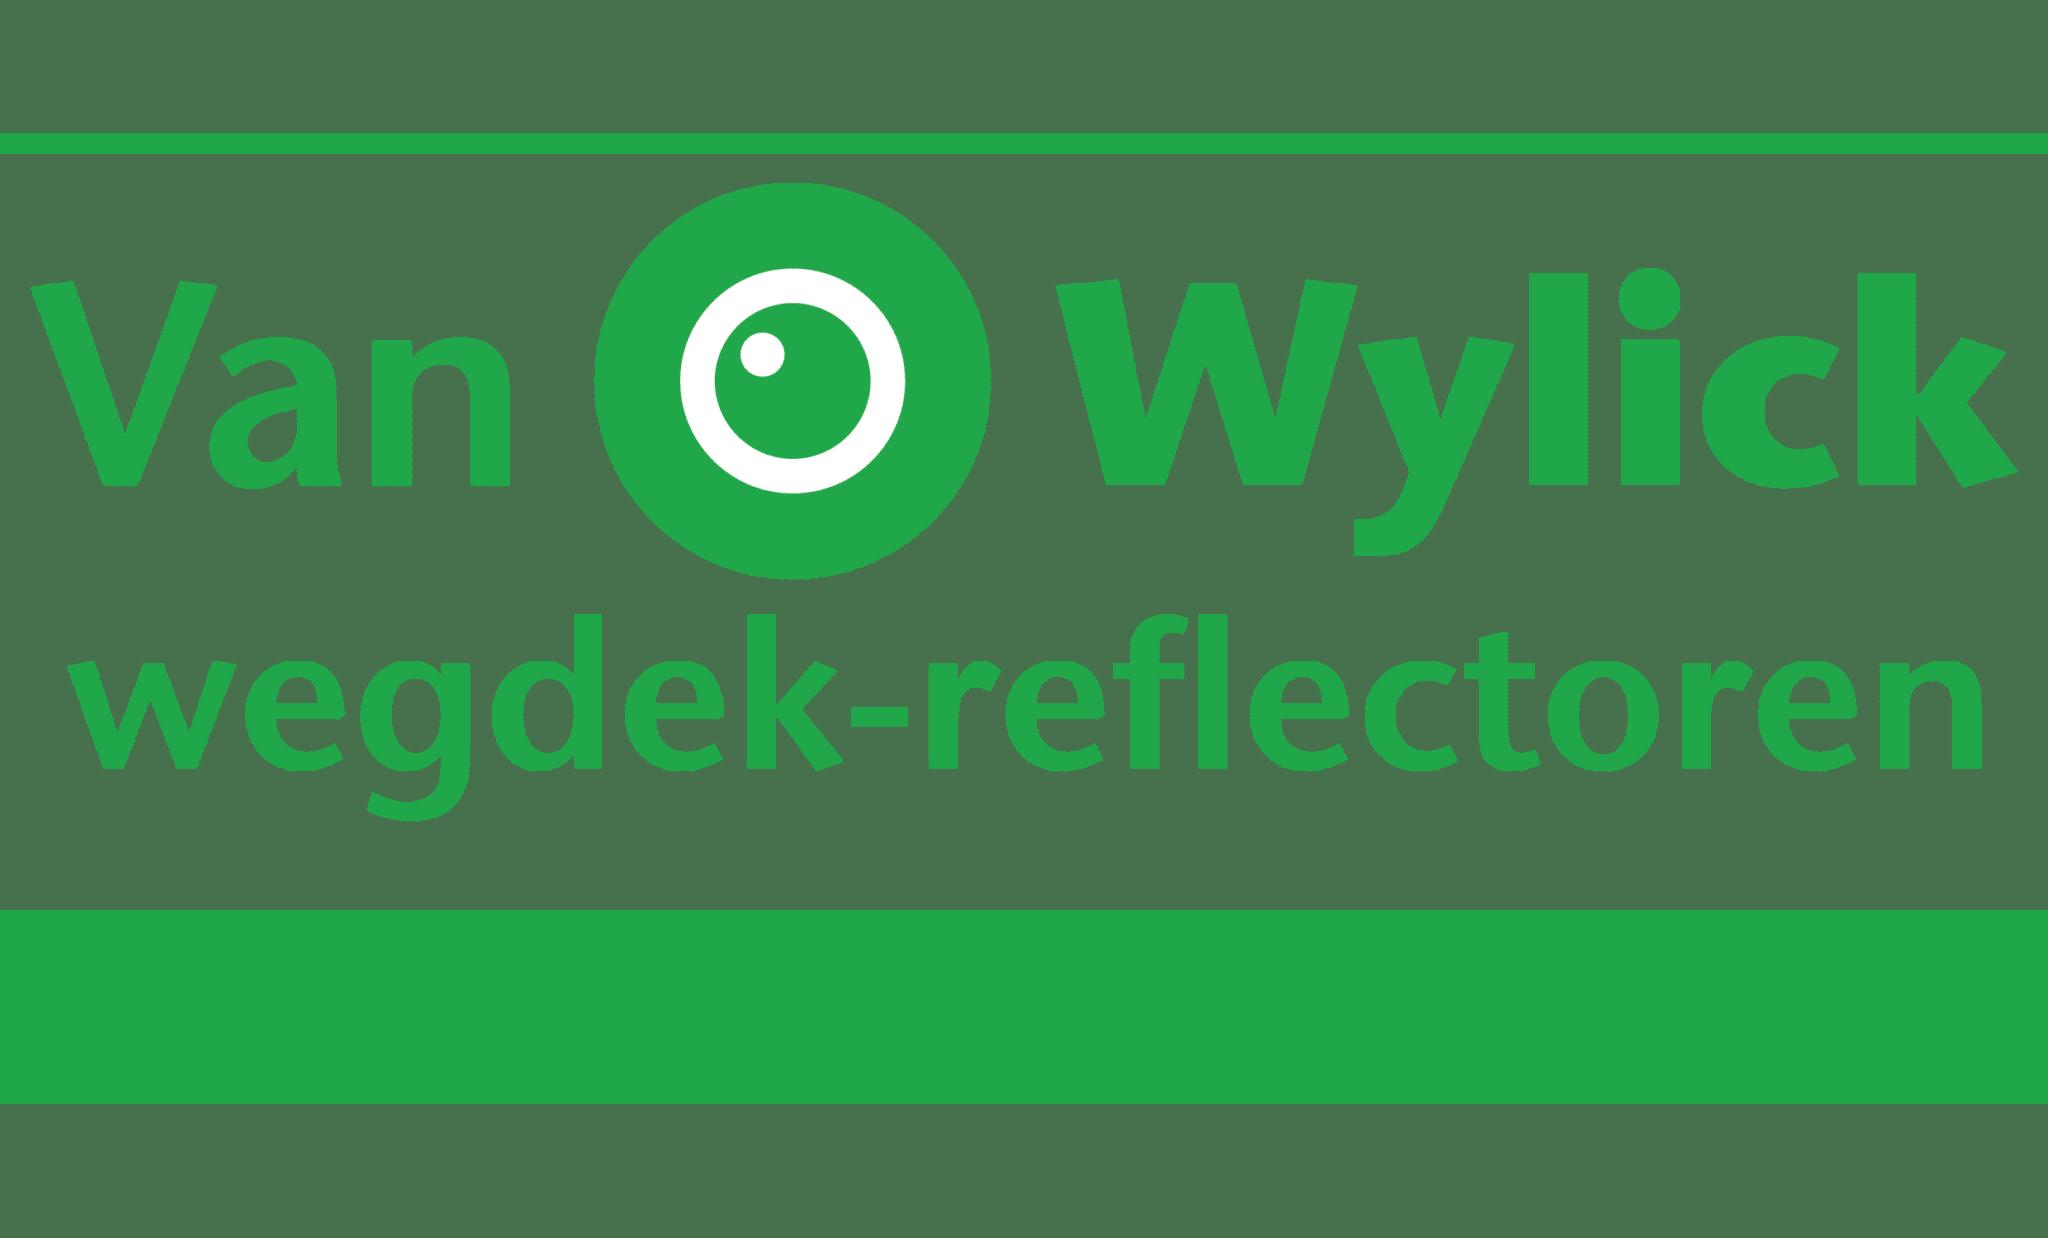 Wegdekreflectoren.nl